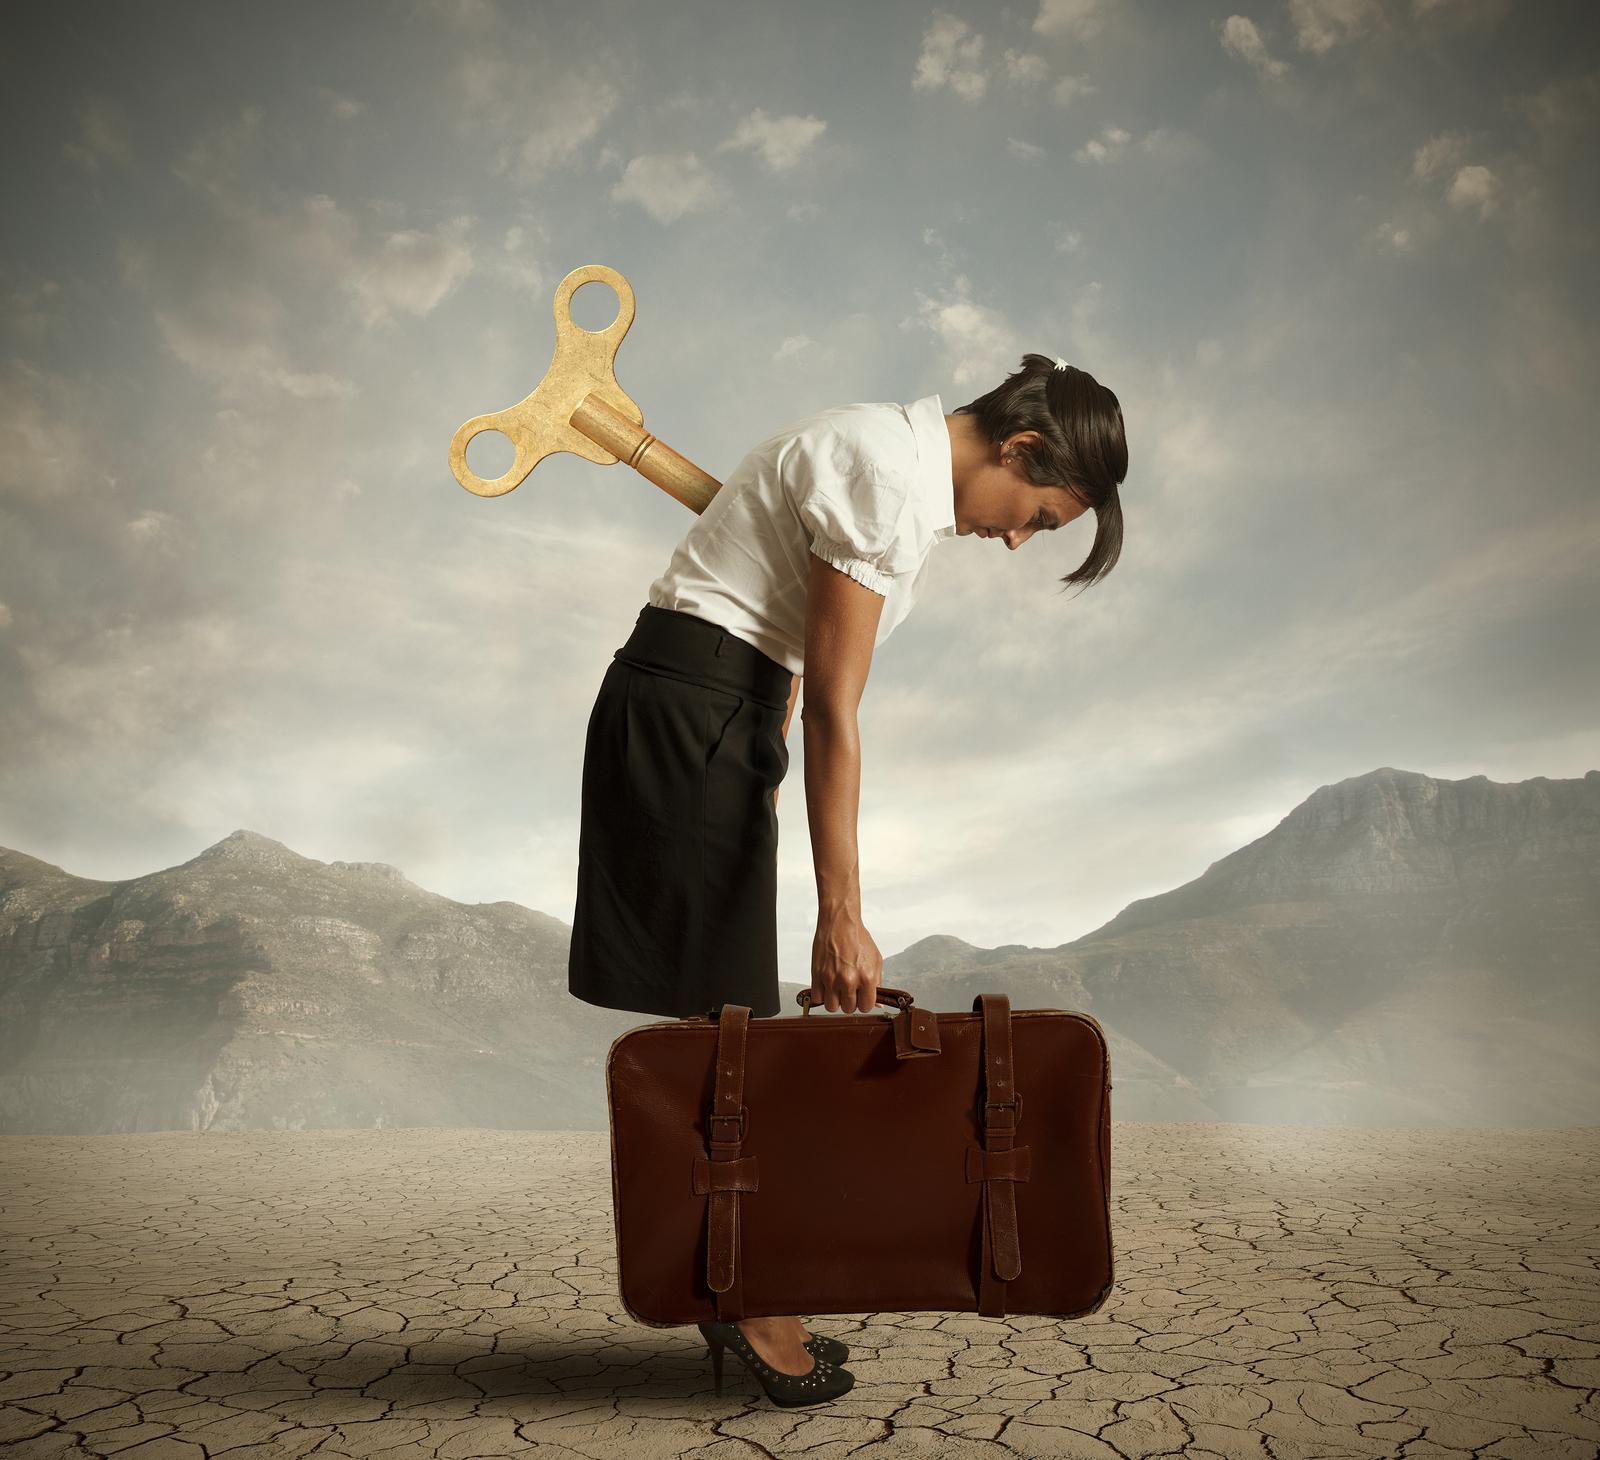 bigstock-Exhausted-Businesswoman-40332463